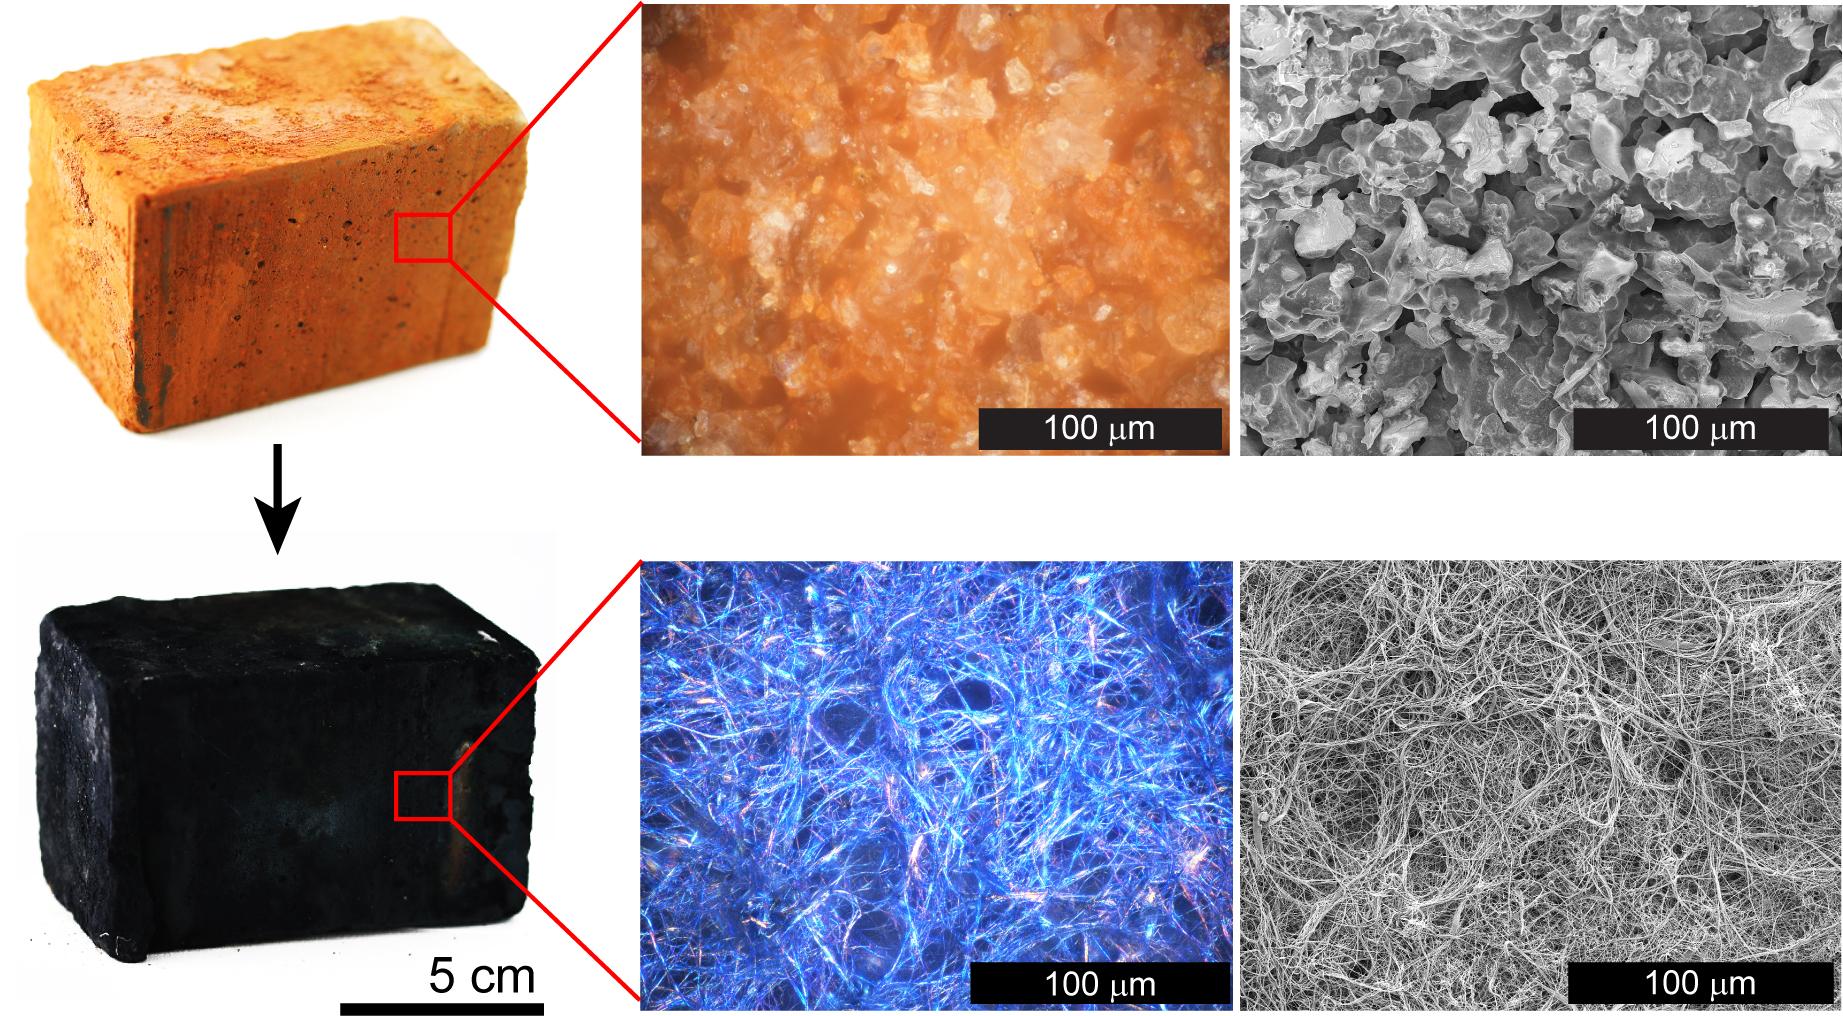 Foto dan gambar mikroskop ini menunjukkan struktur batu bata terbakar sebelum dan sesudah pengendapan lapisan nanofibrillar yang meningkatkan luas permukaan di dalam batu. Gambar: Laboratorium D'Arcy di Universitas Washington, St. Louis.